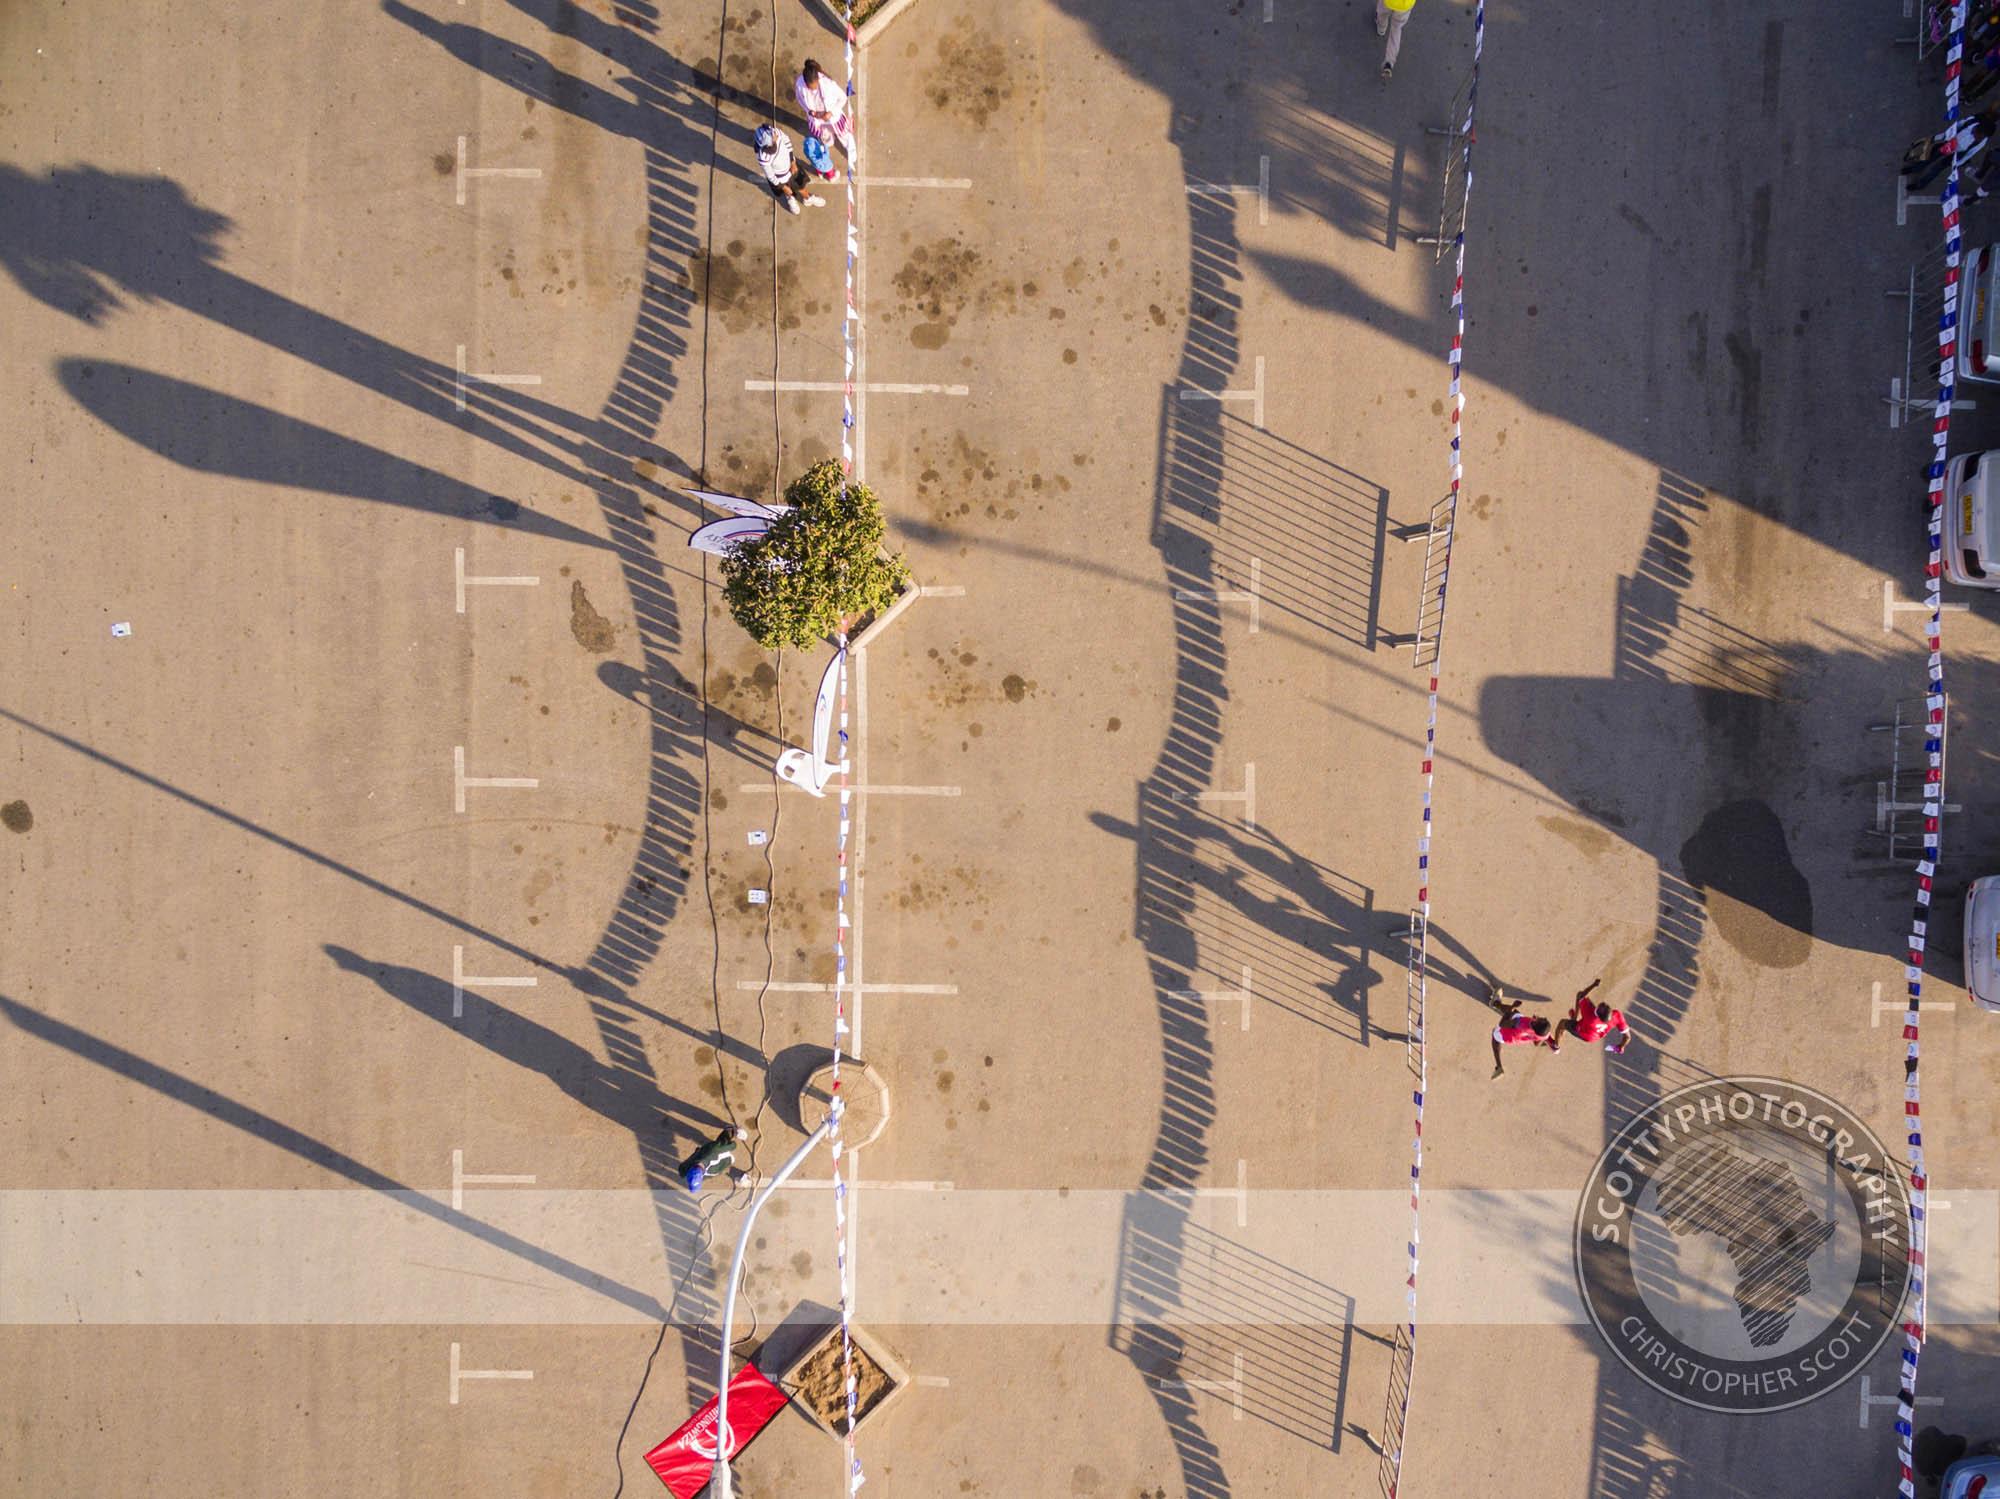 Drone images - July newsletter (23).jpg